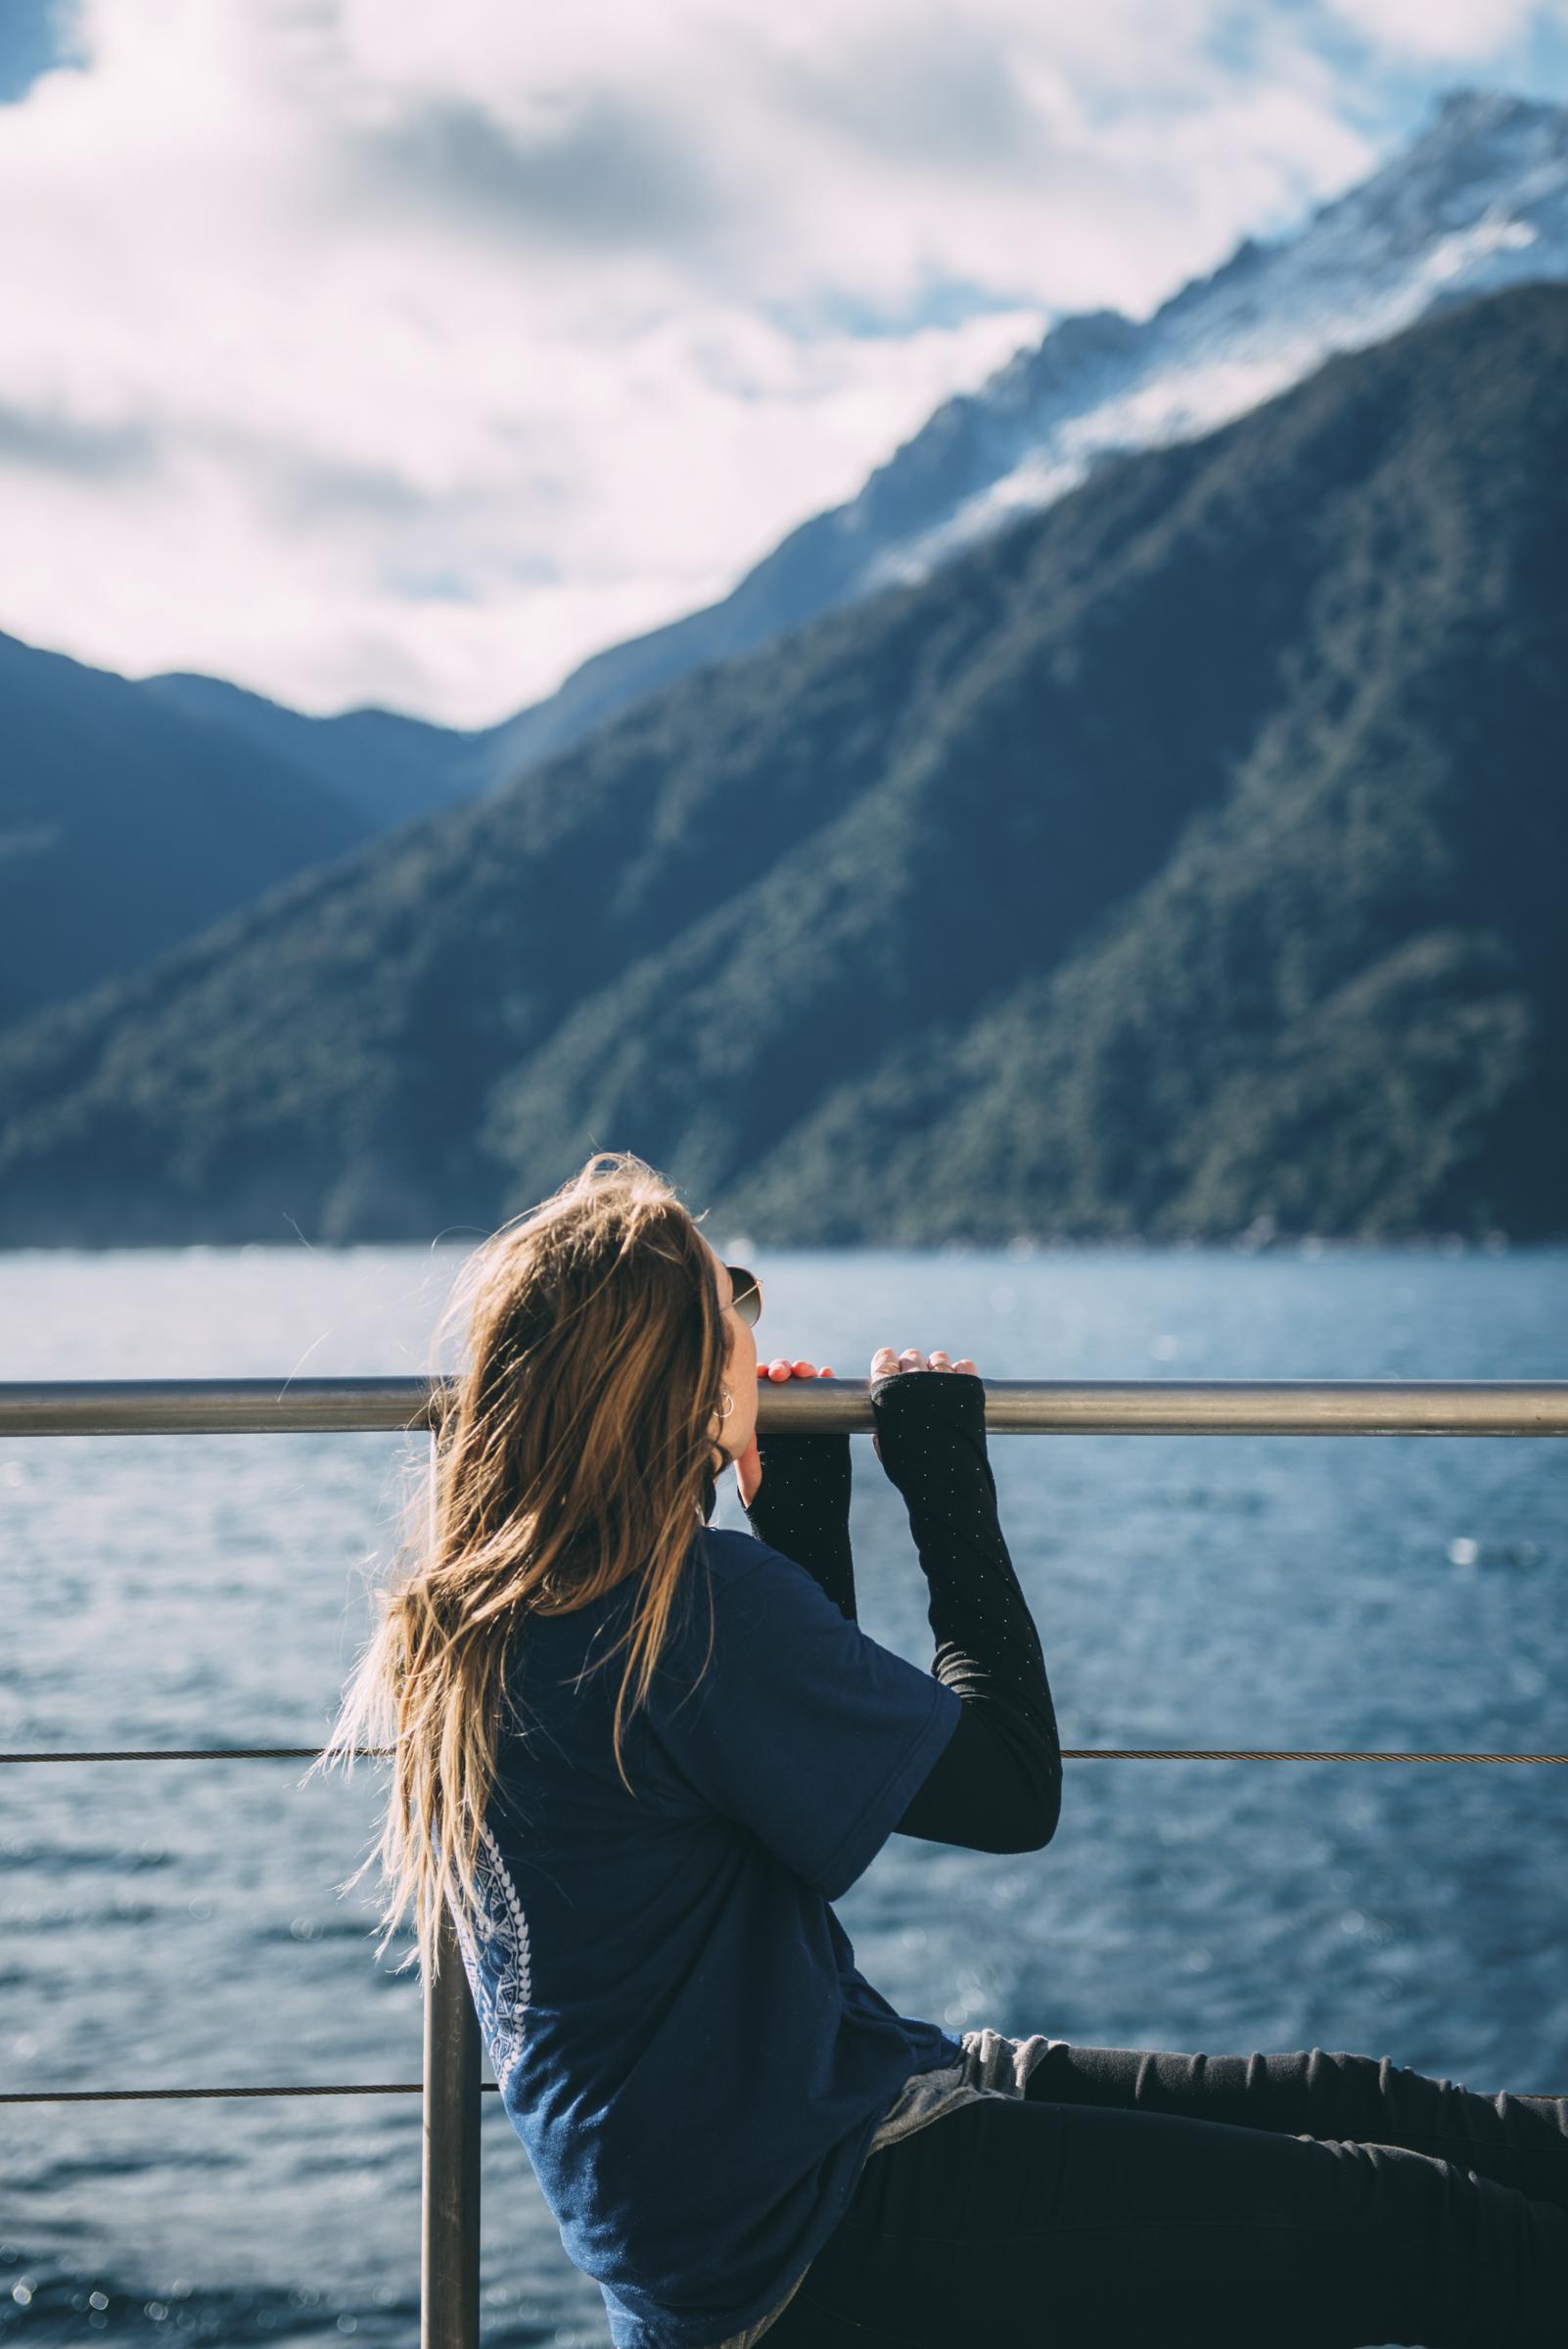 New Zealand Road Trip Lola Photography WEB_040.jpg